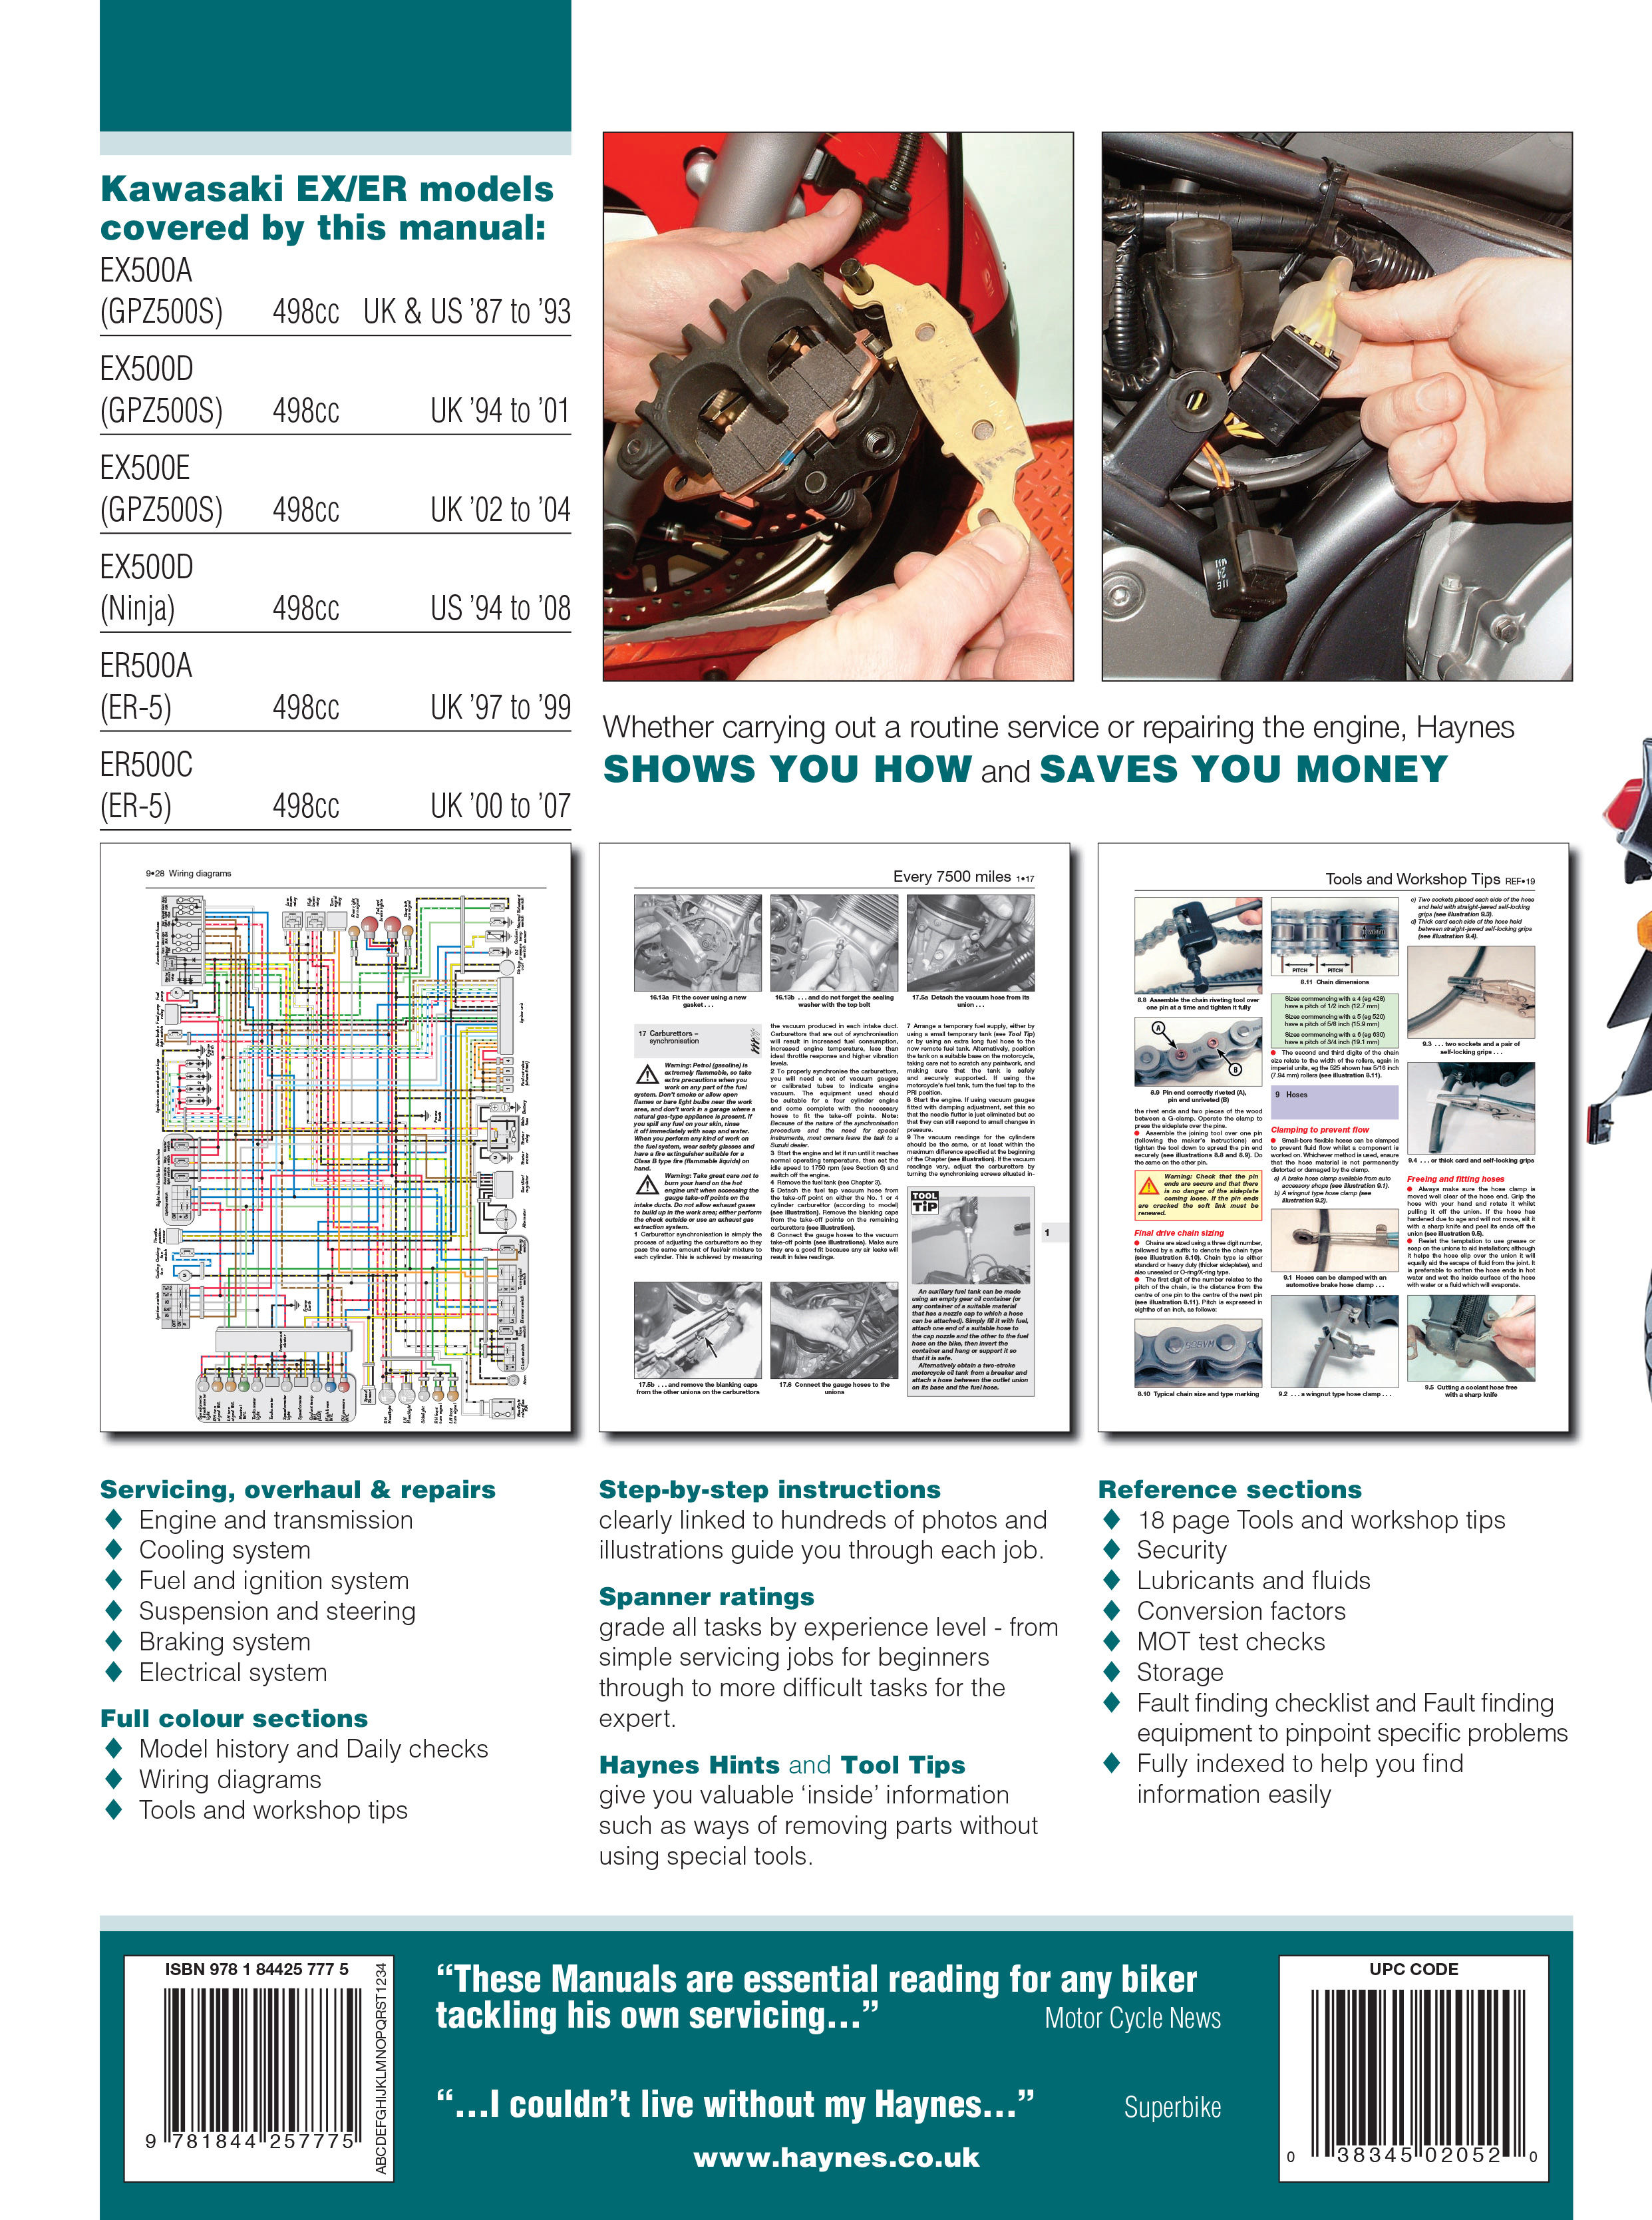 Kawasaki Gpz500s Wiring Diagram Schematic Diagrams Superior Broom Ex500 Er500 Er 5 87 08 Haynes Repair